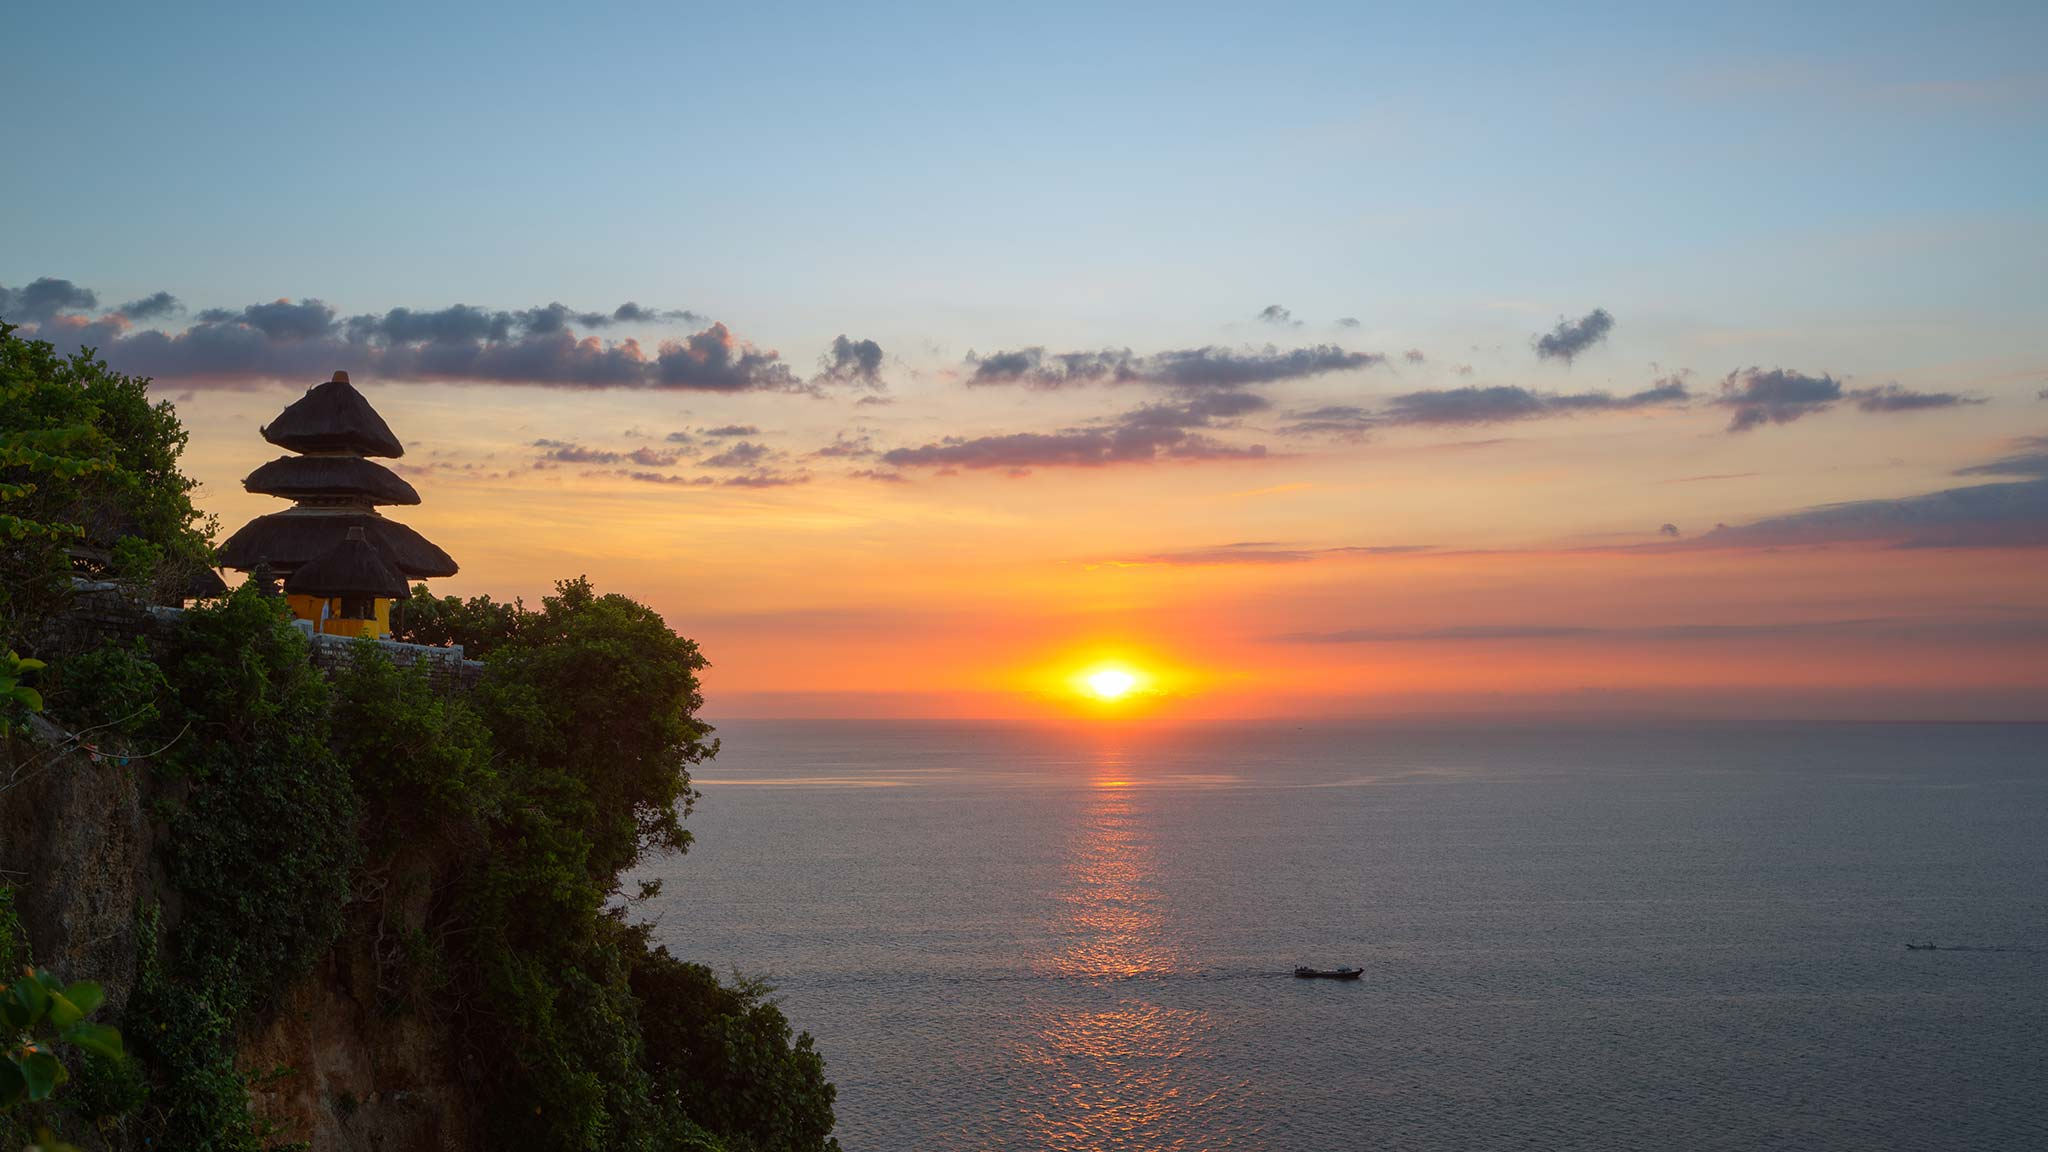 View Uluwatu Temple overlooking the ocean in Bali